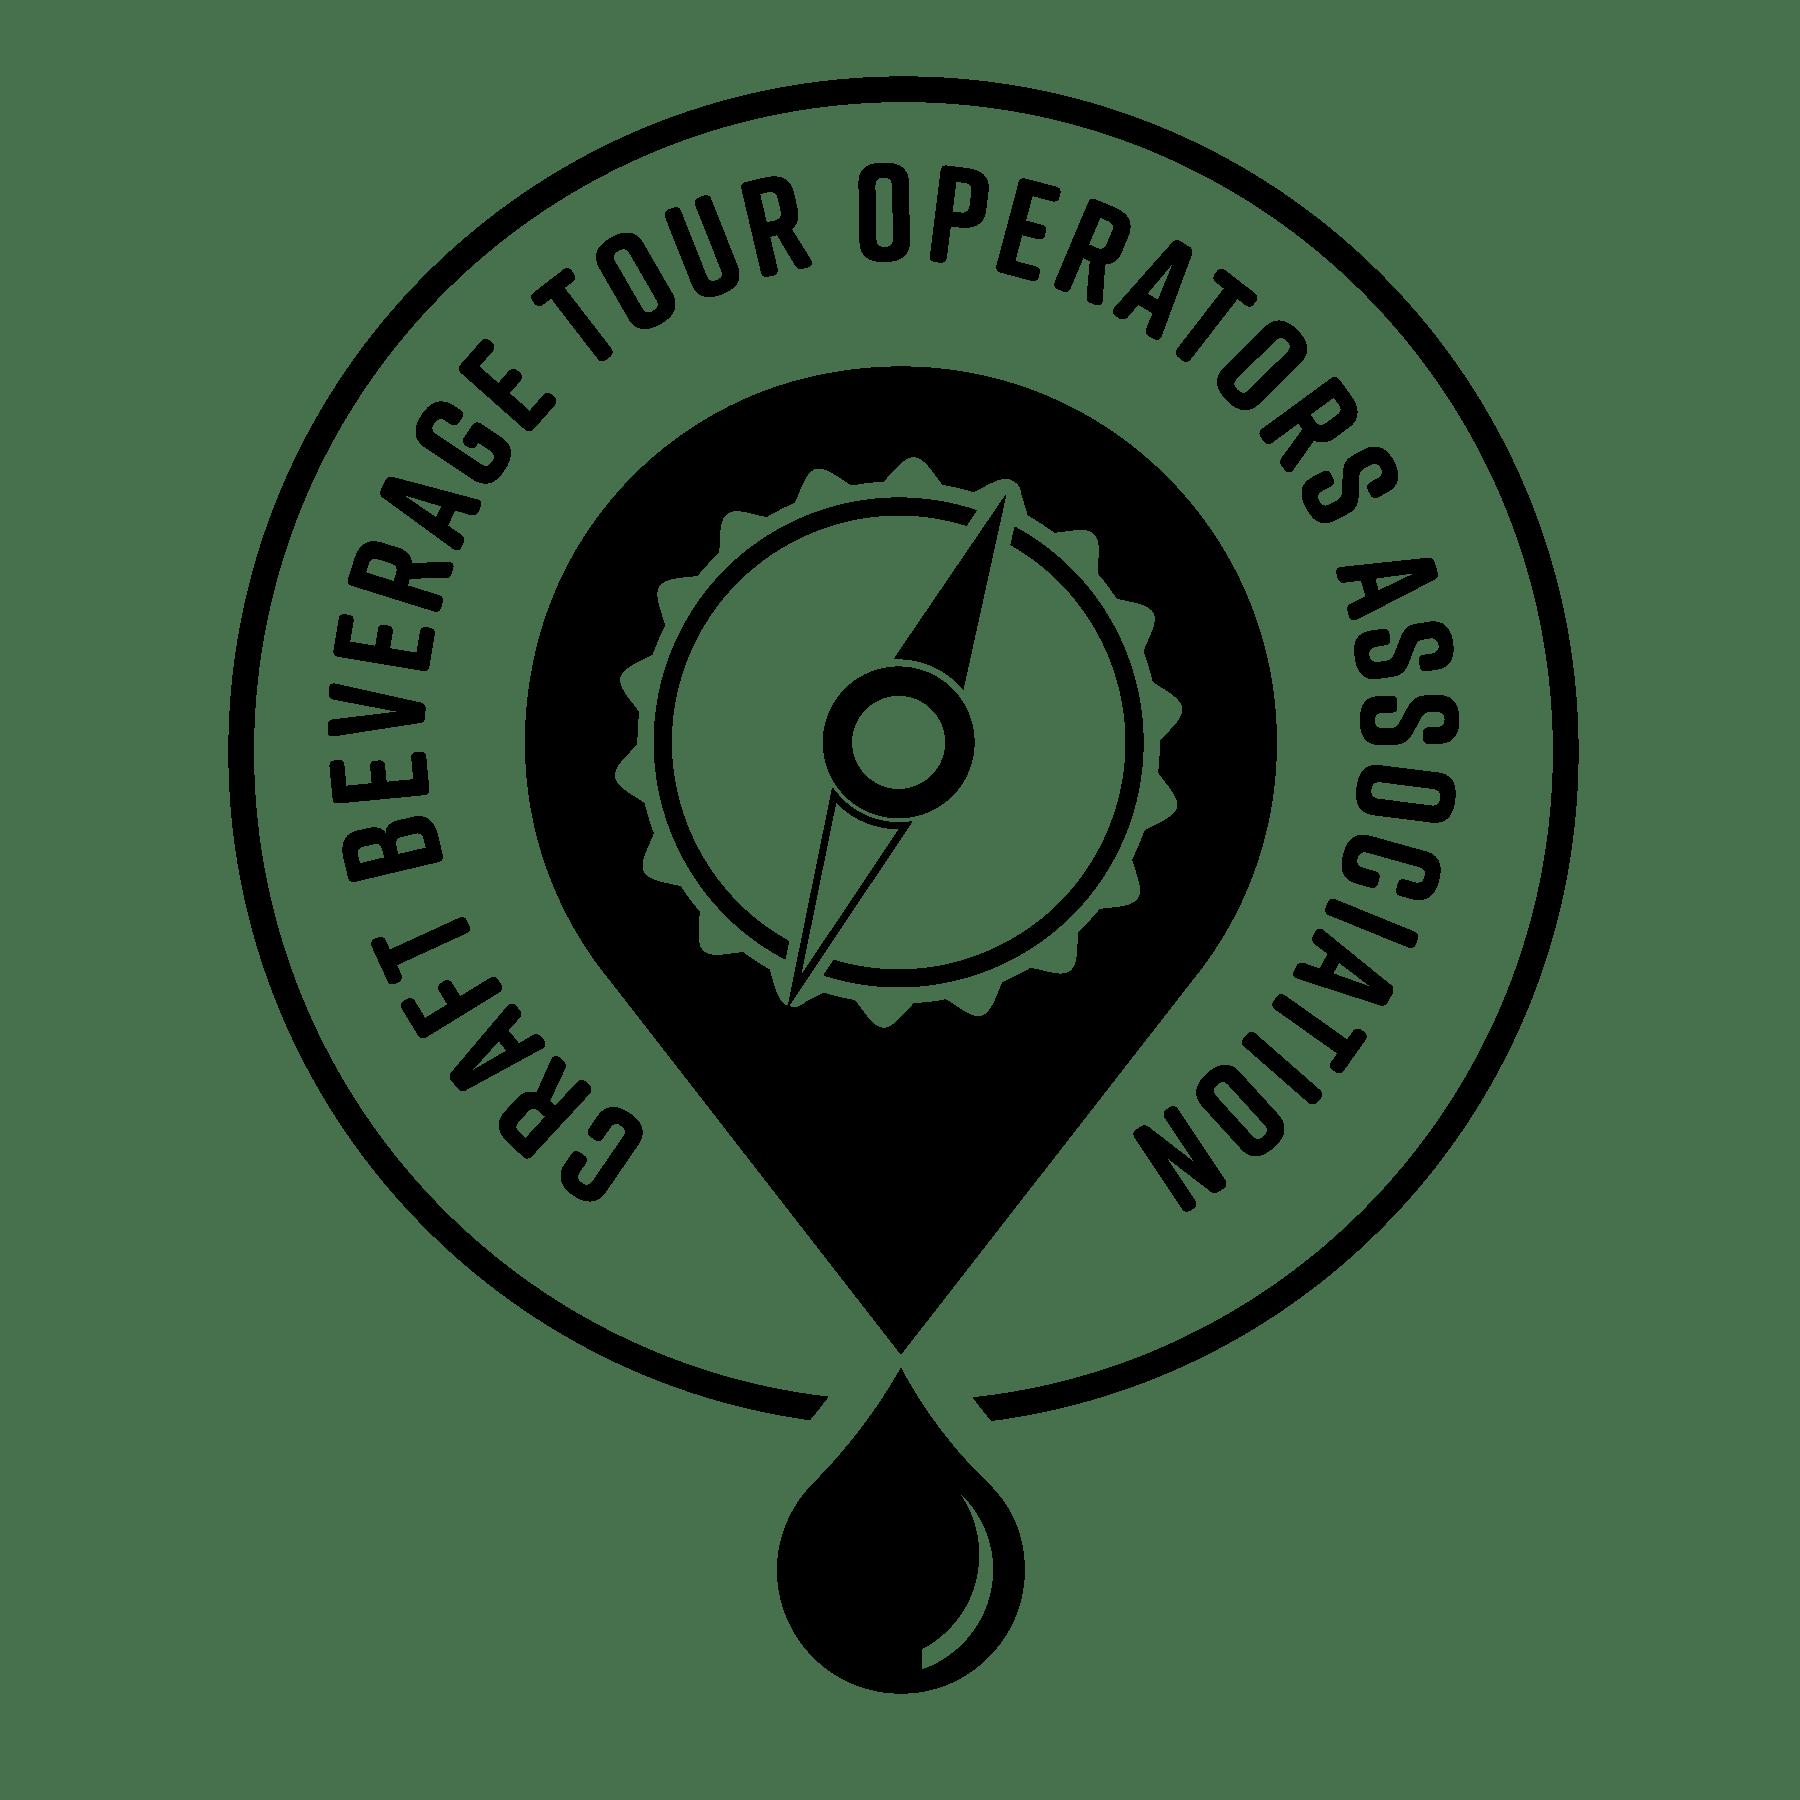 Craft Beverage Tour Operator Association